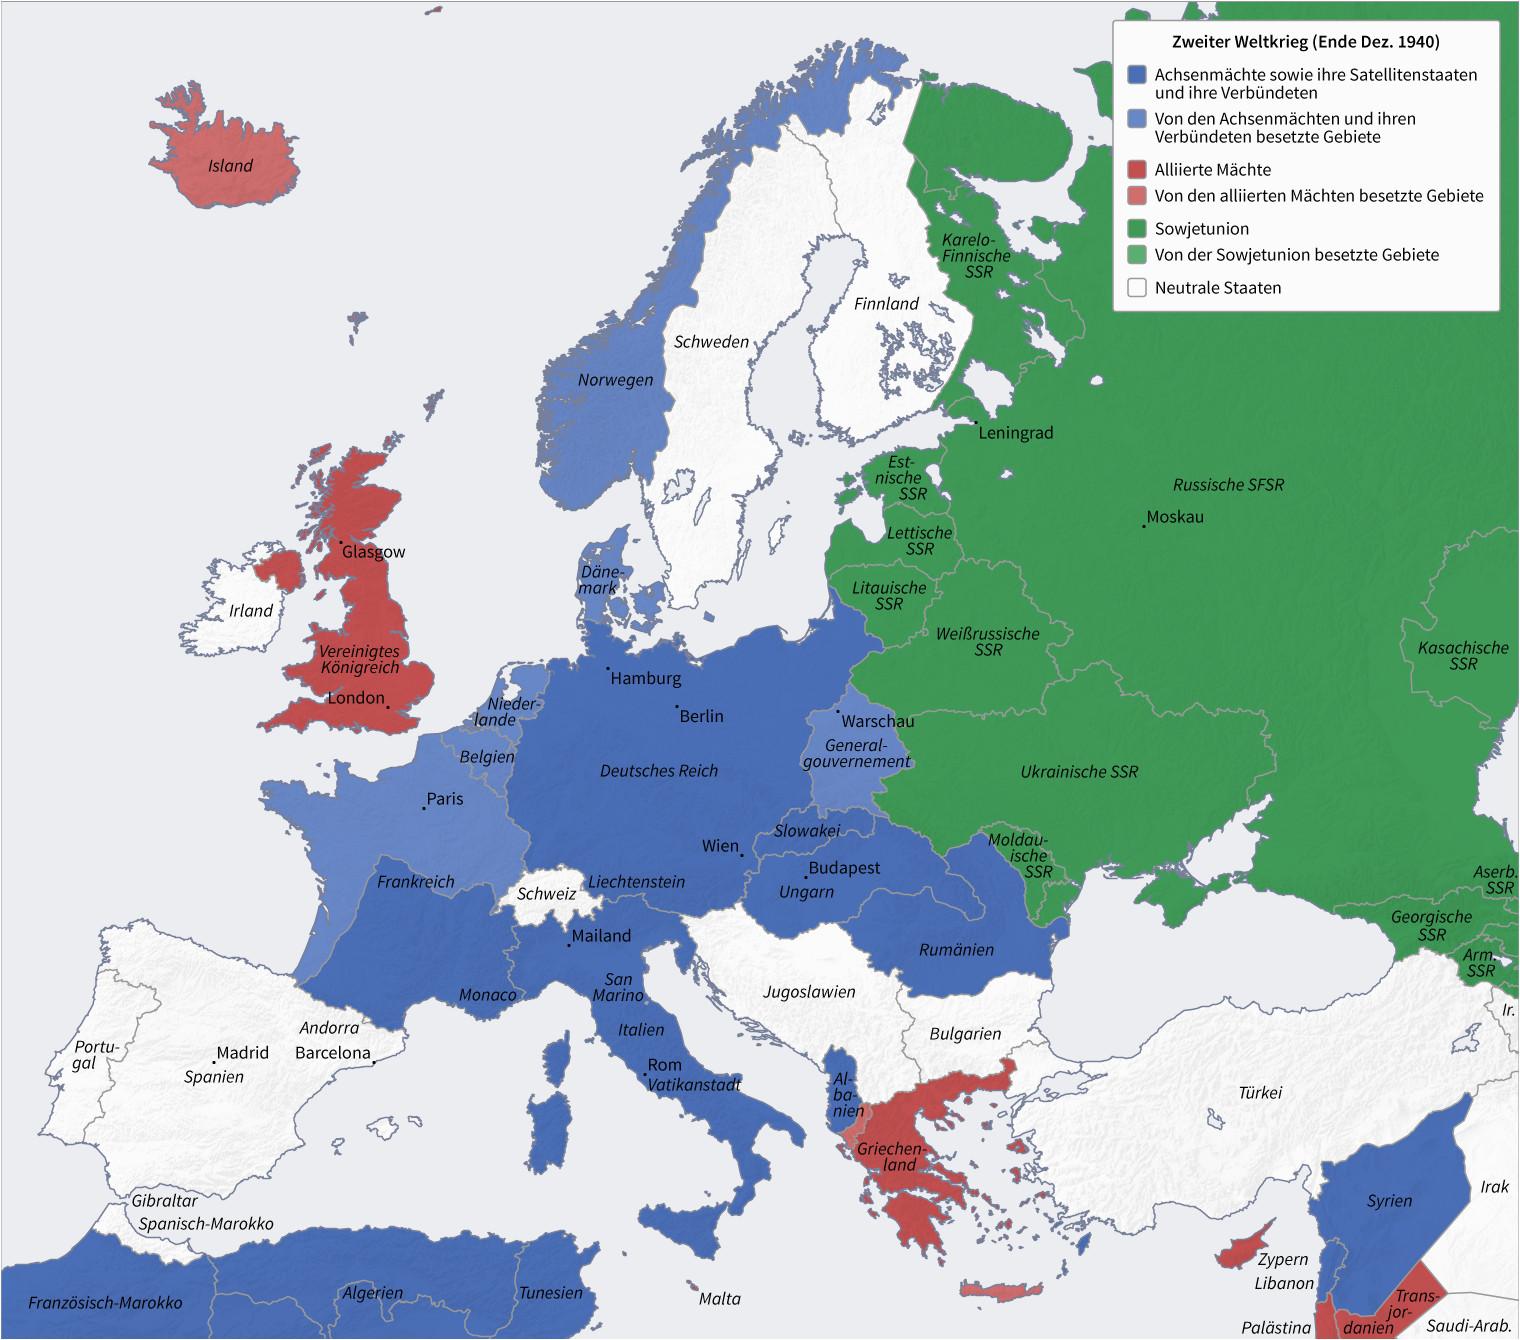 1940 Map Of Europe Datei Second World War Europe 12 1940 De Png Wikipedia